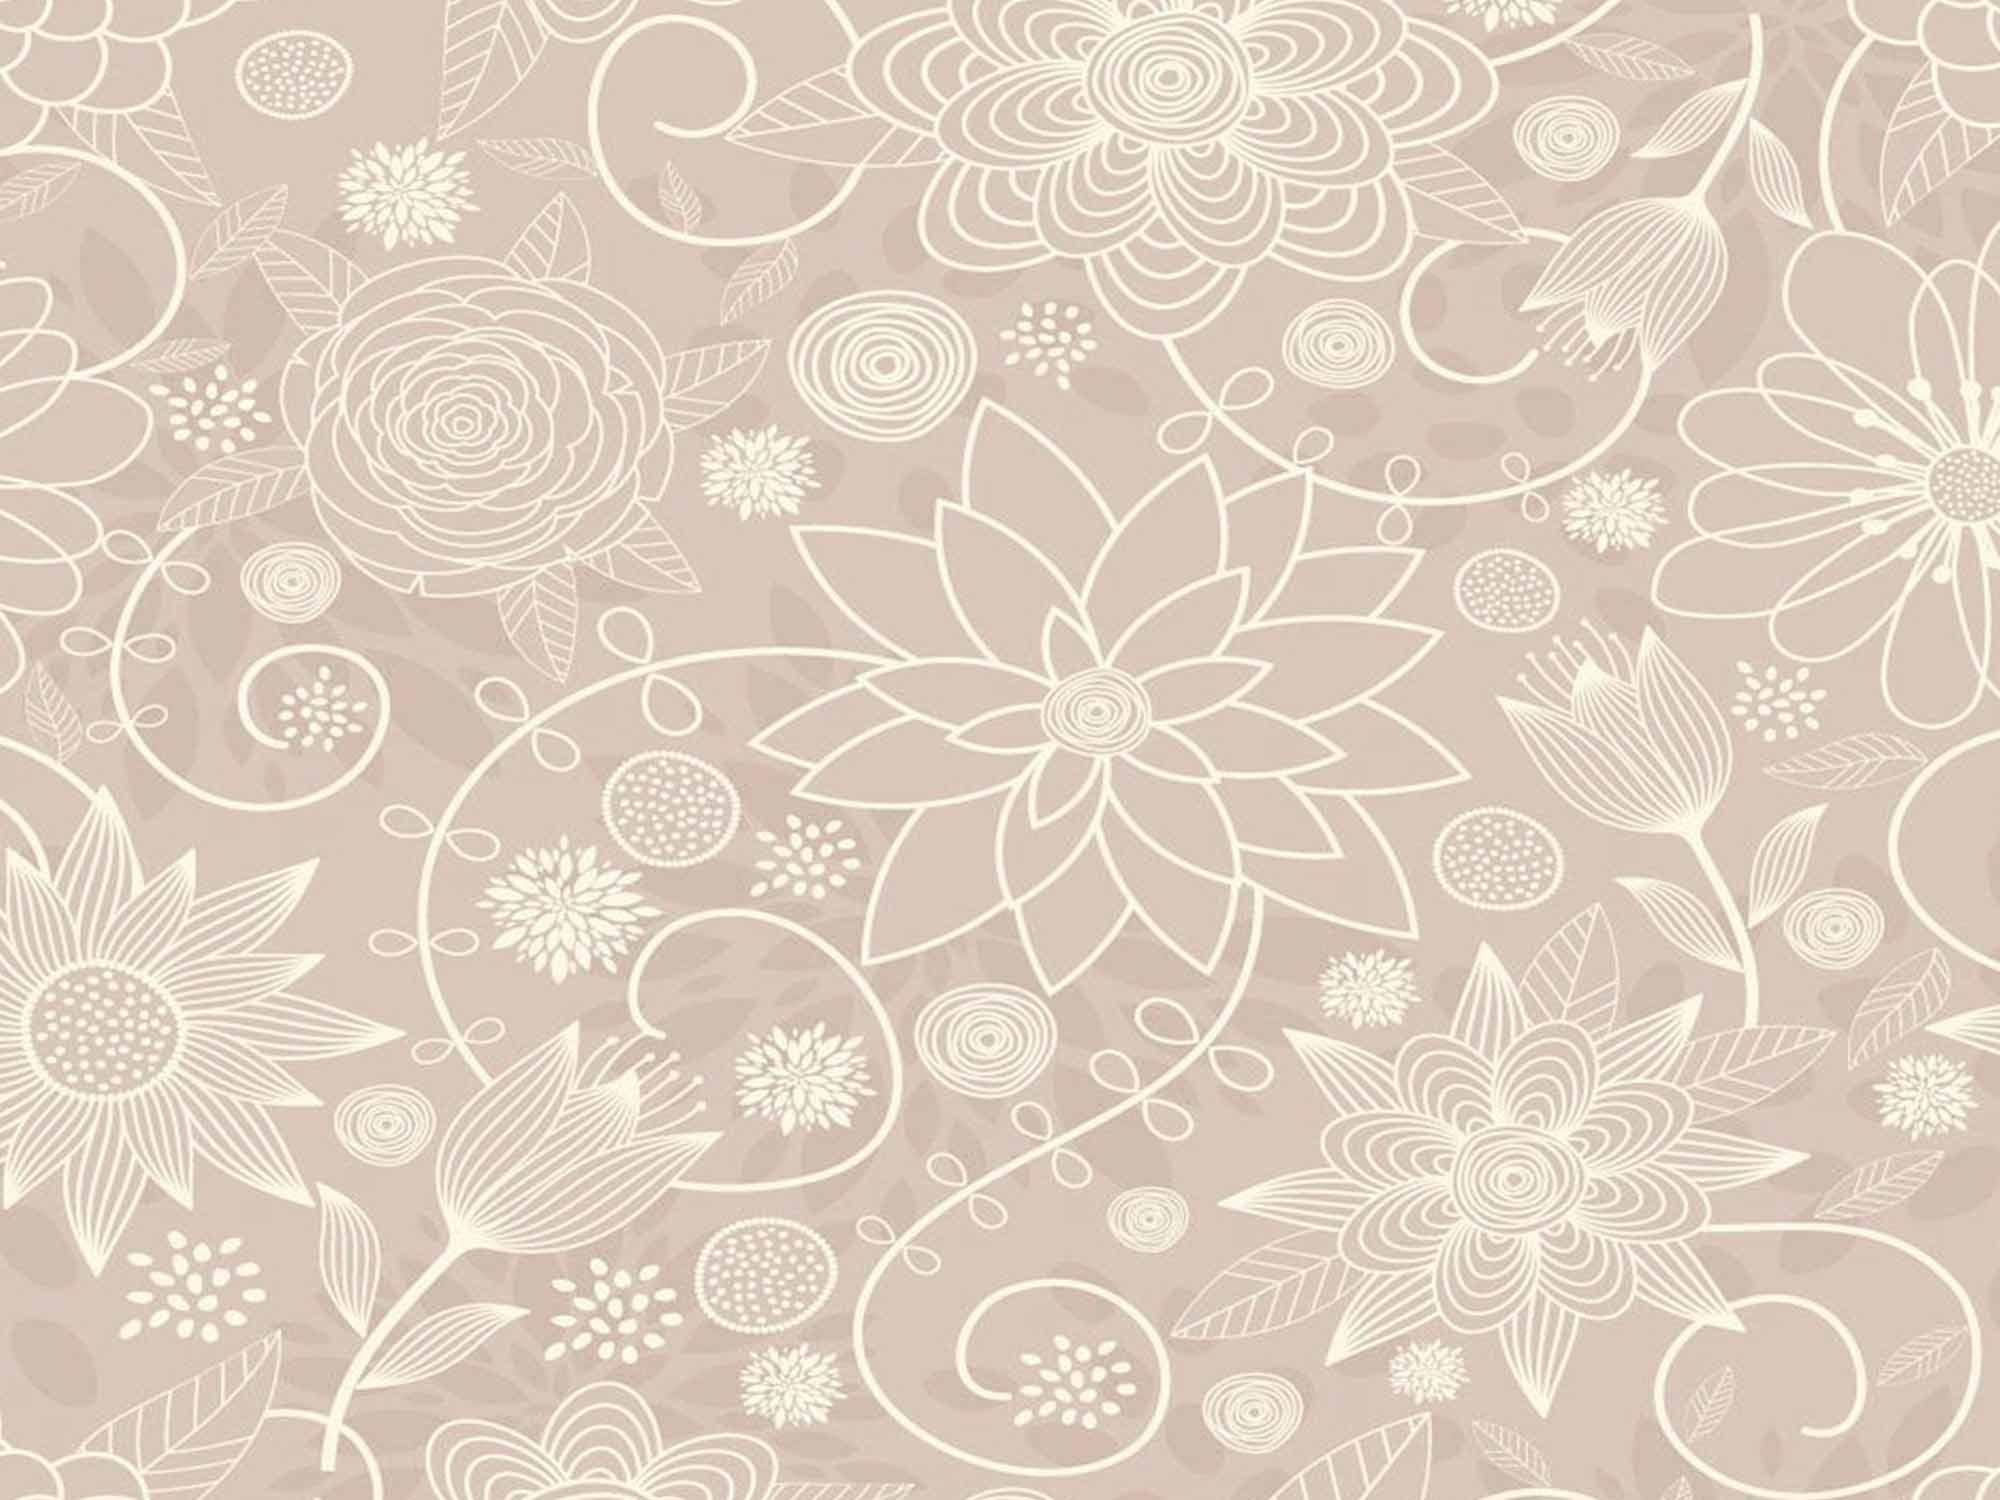 Papel de Parede Floral 0064 - Adesivos de Parede  - Paredes Decoradas